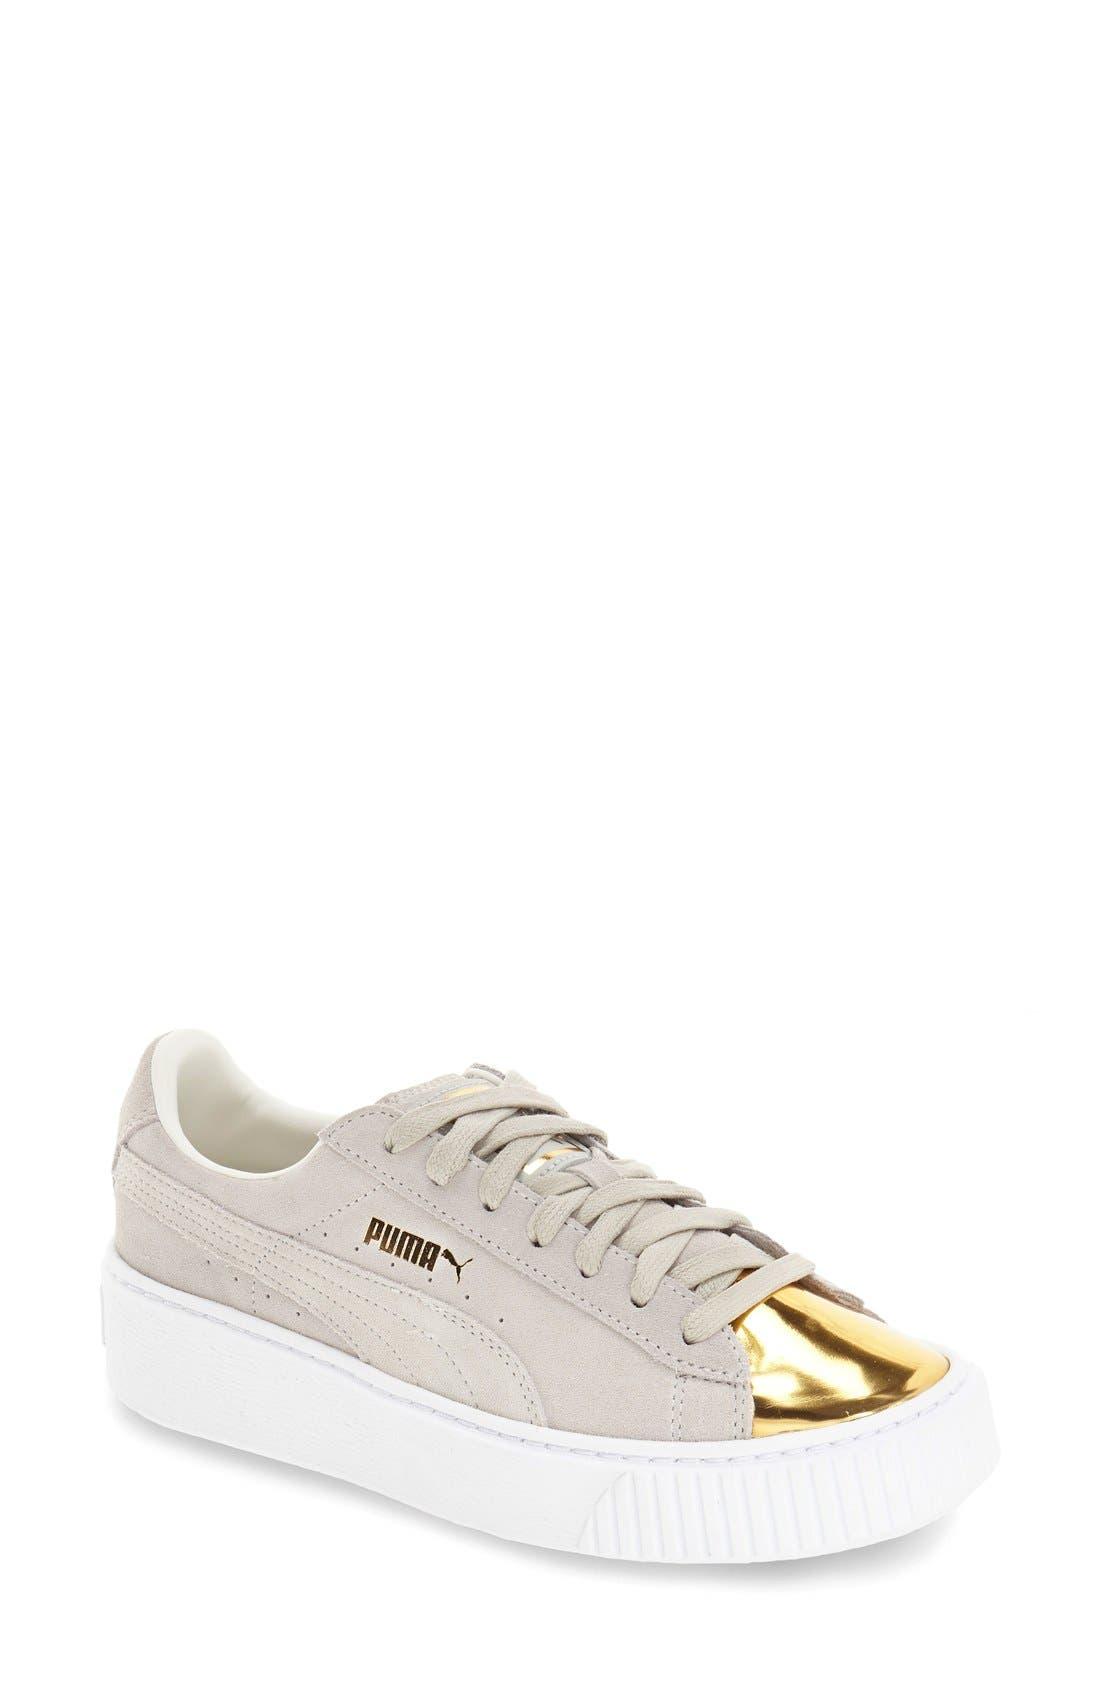 Main Image - PUMA Platform Sneaker (Women)